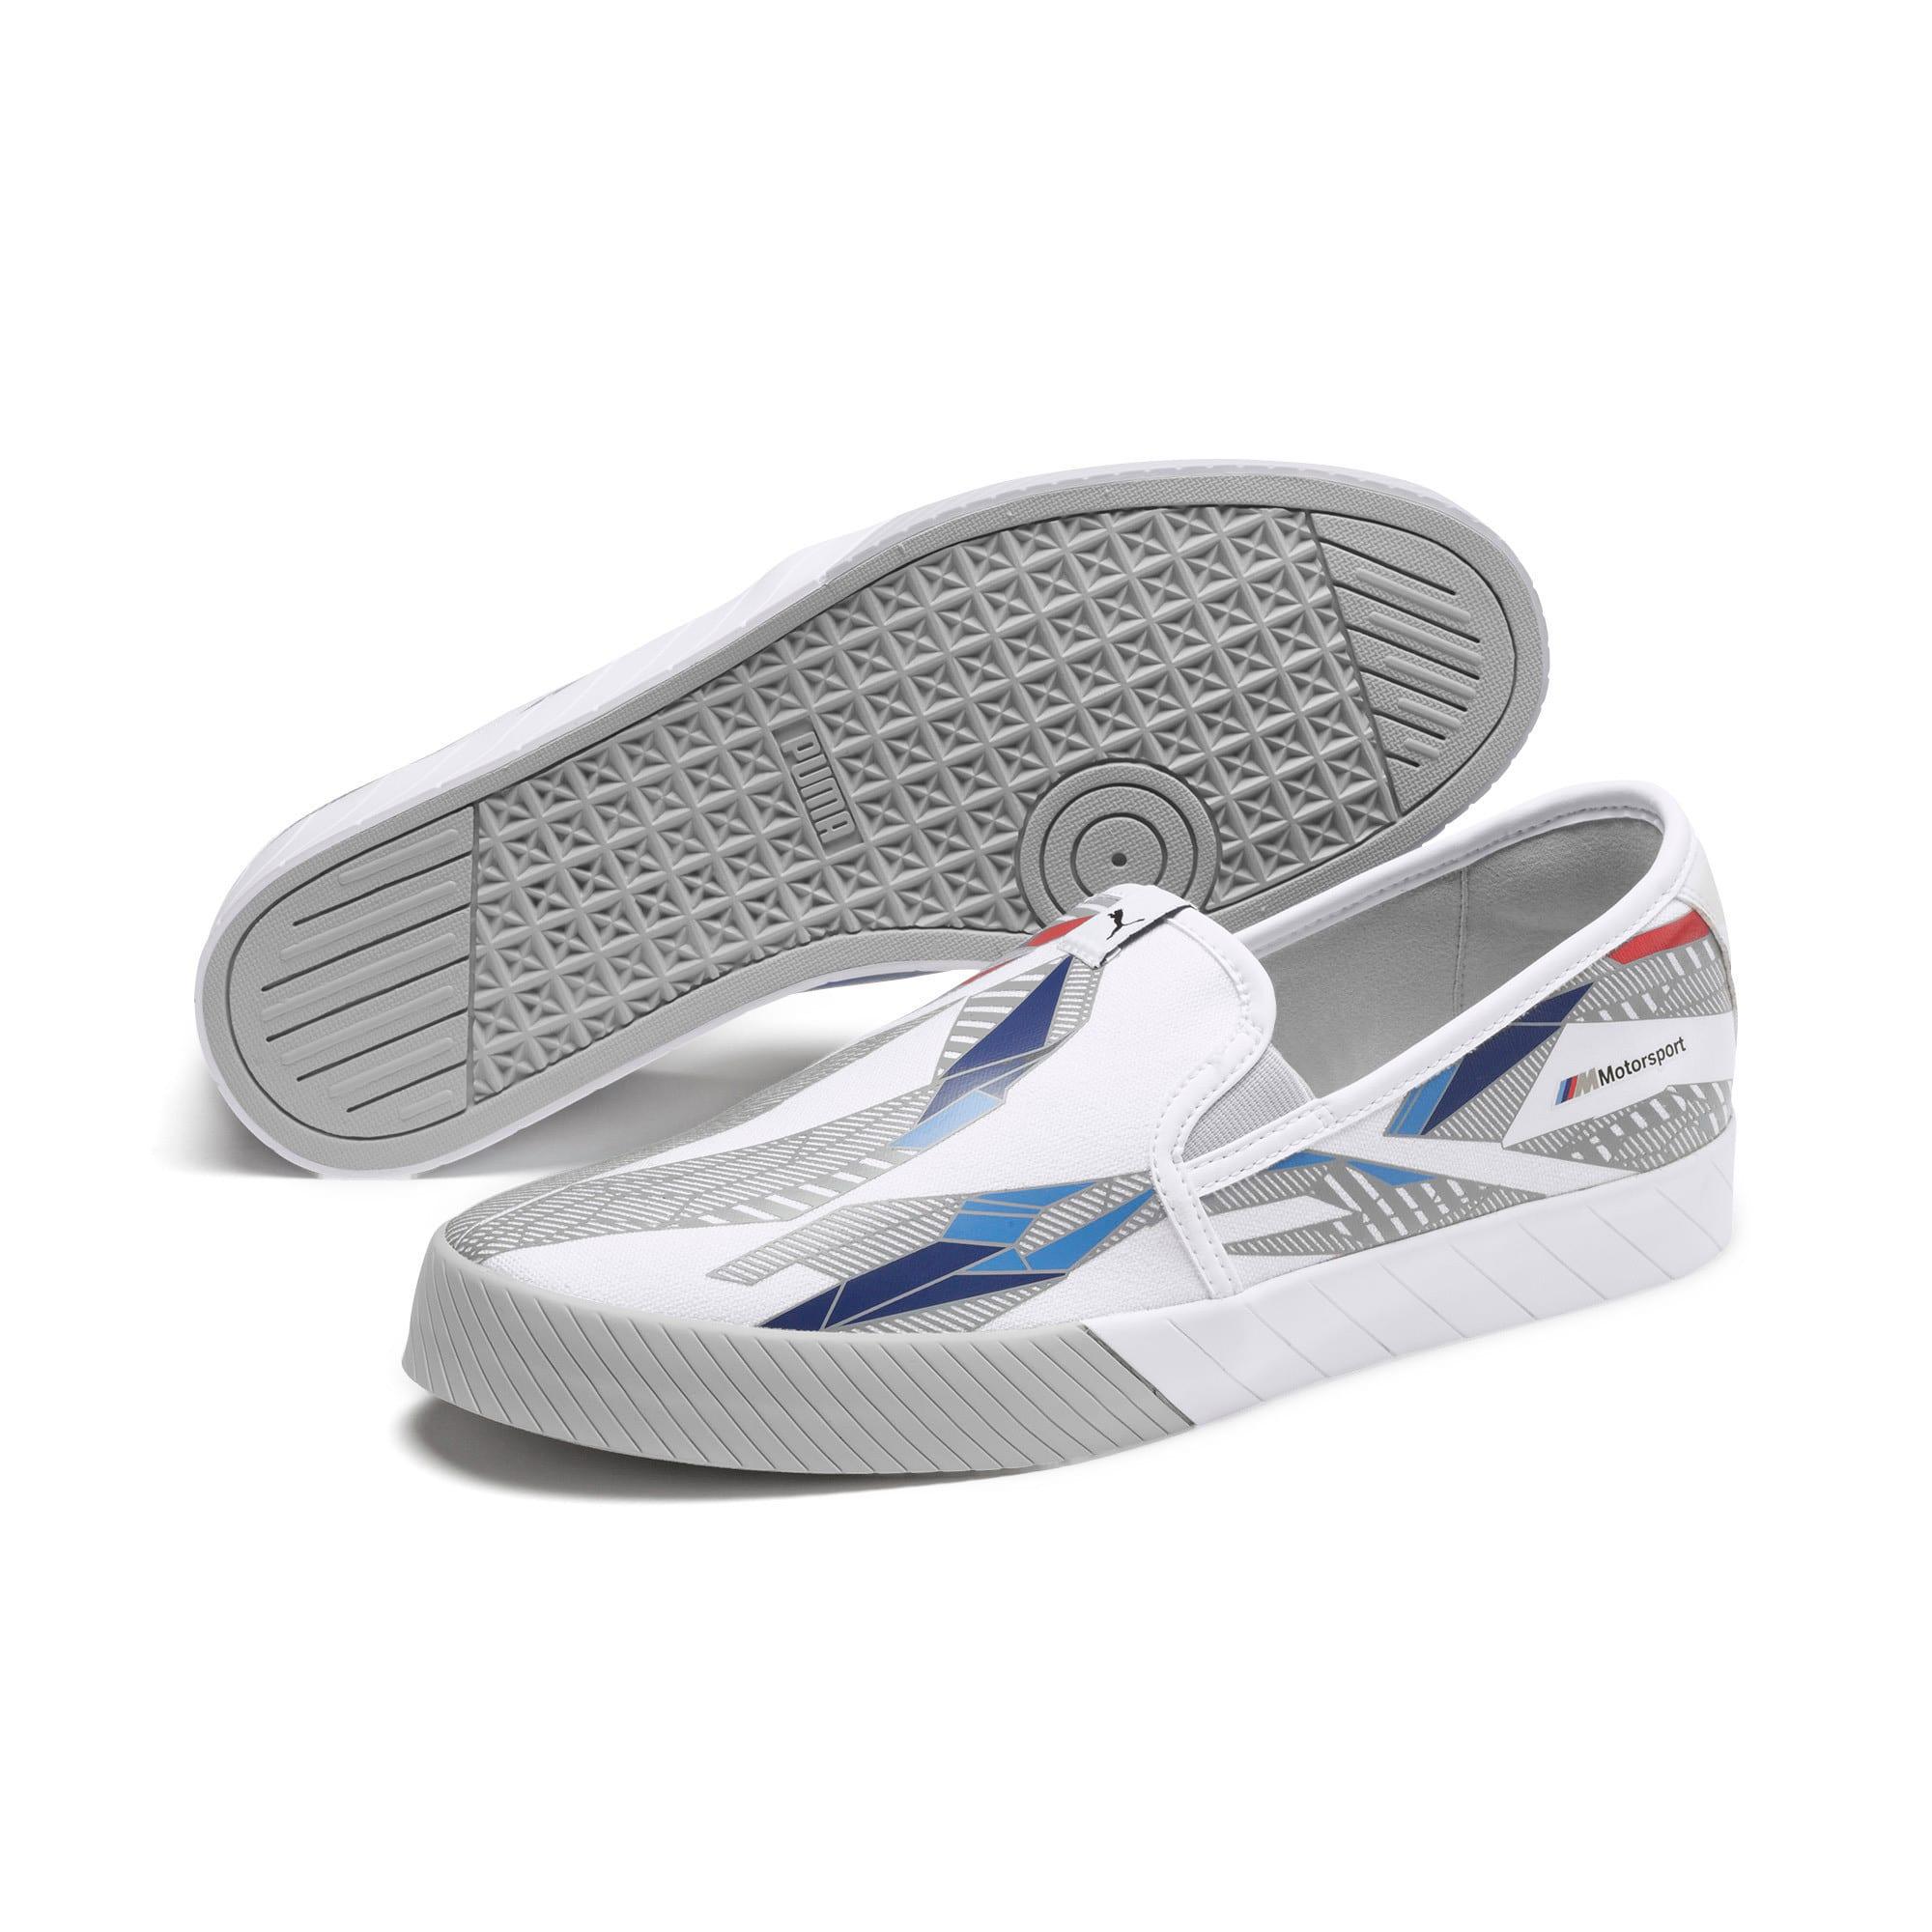 Thumbnail 3 of BMW M Motorsport Slip-On Gradient Track Shoes, Puma White-Gray Violet, medium